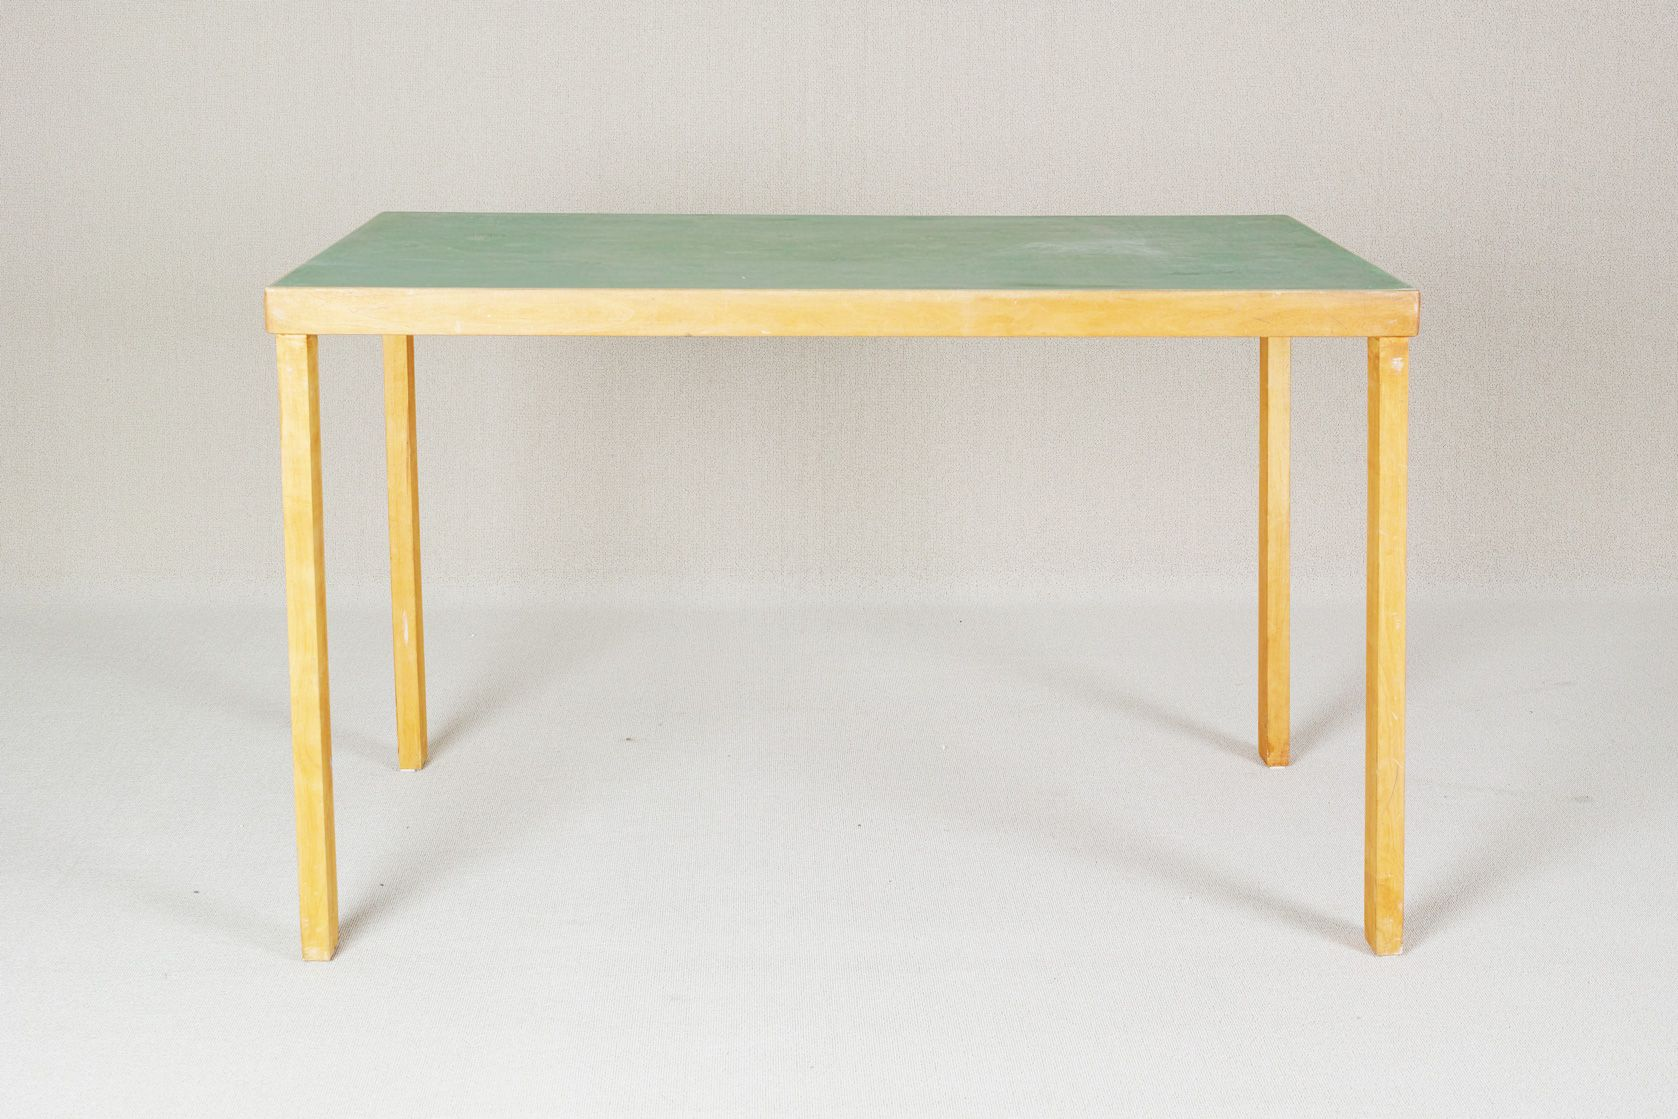 vintage tisch von alvar aalto f r huonekalu ja. Black Bedroom Furniture Sets. Home Design Ideas